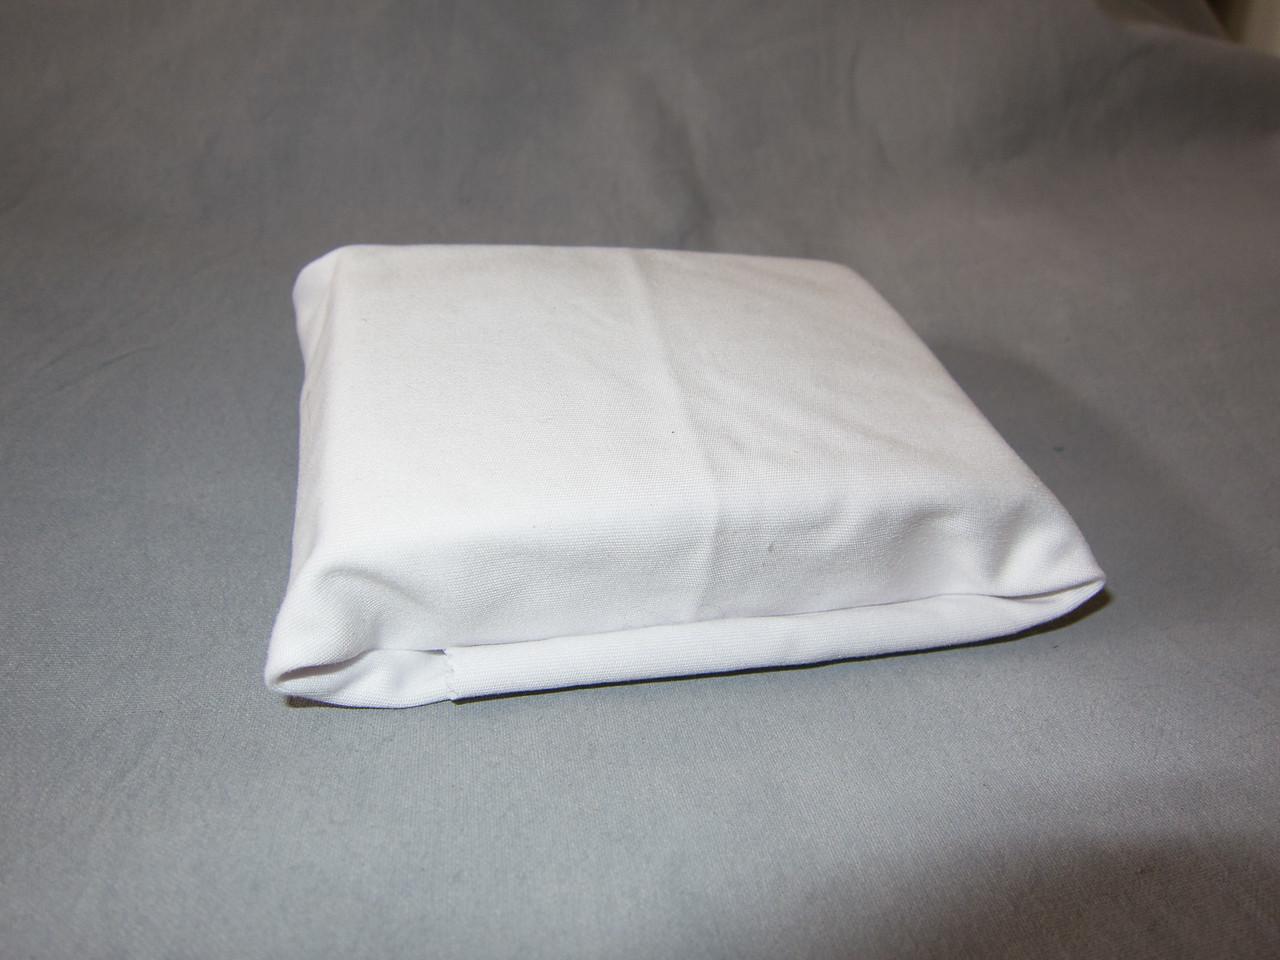 Lens cloth and foam